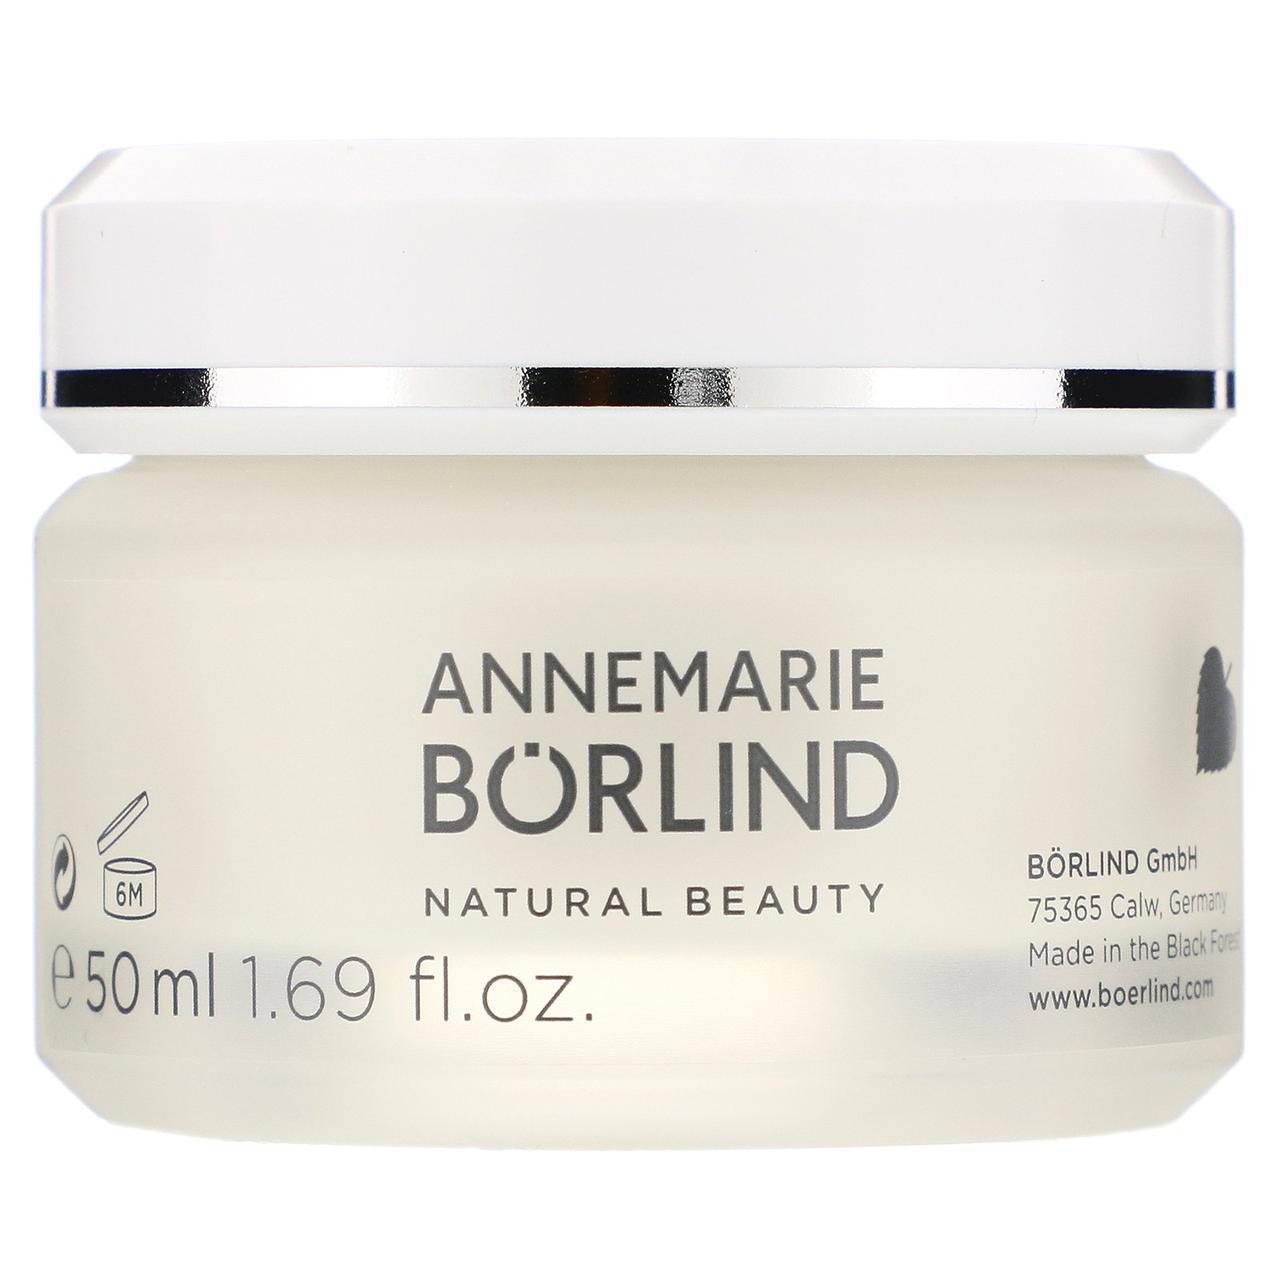 Увлажняющий аква крем для сухой кожи, AnneMarie Borlind, 50 мл